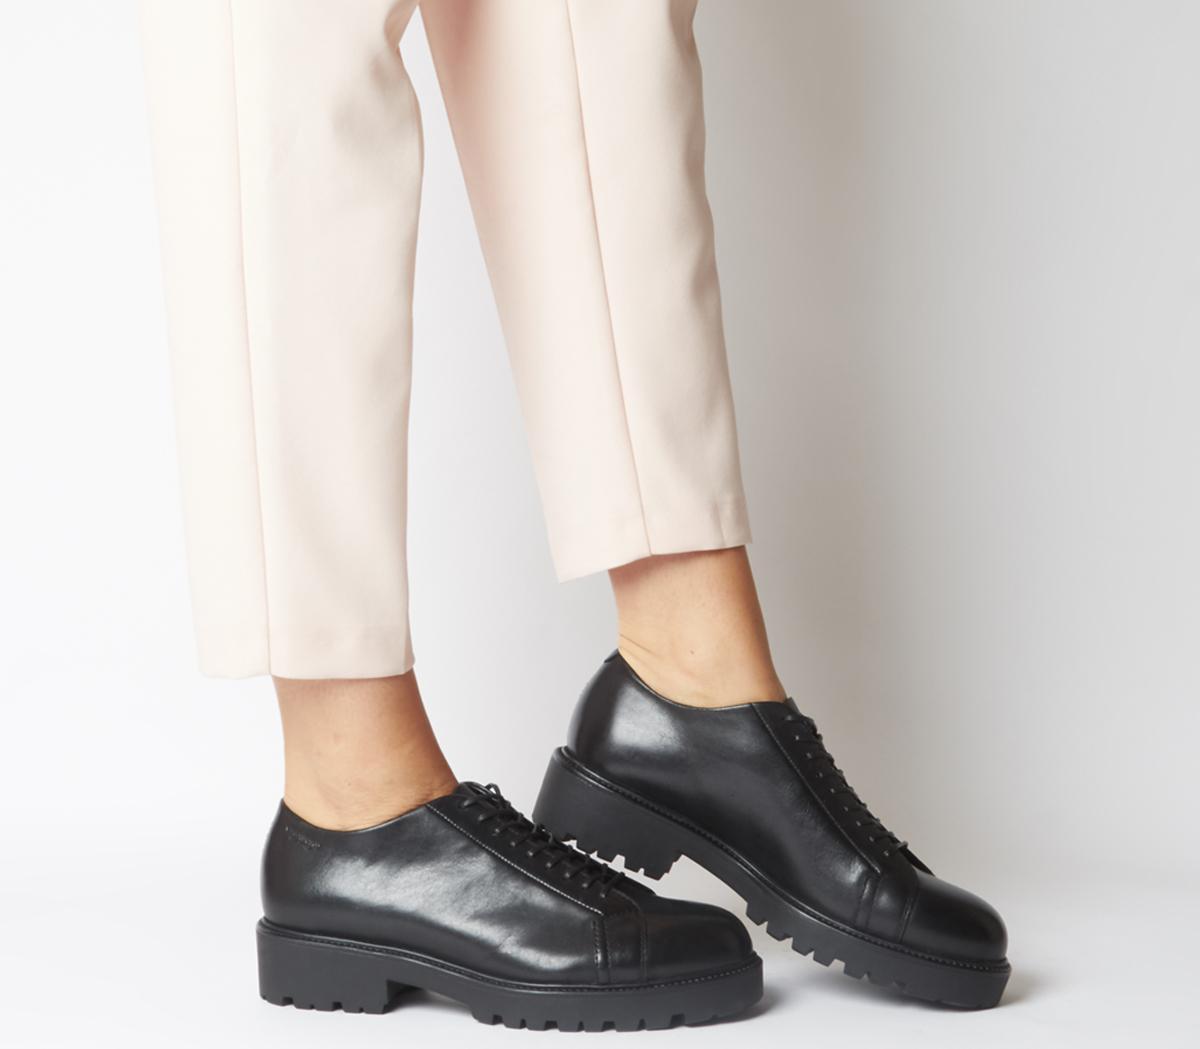 Vagabond Kenova Monkey Shoe Black - Flats